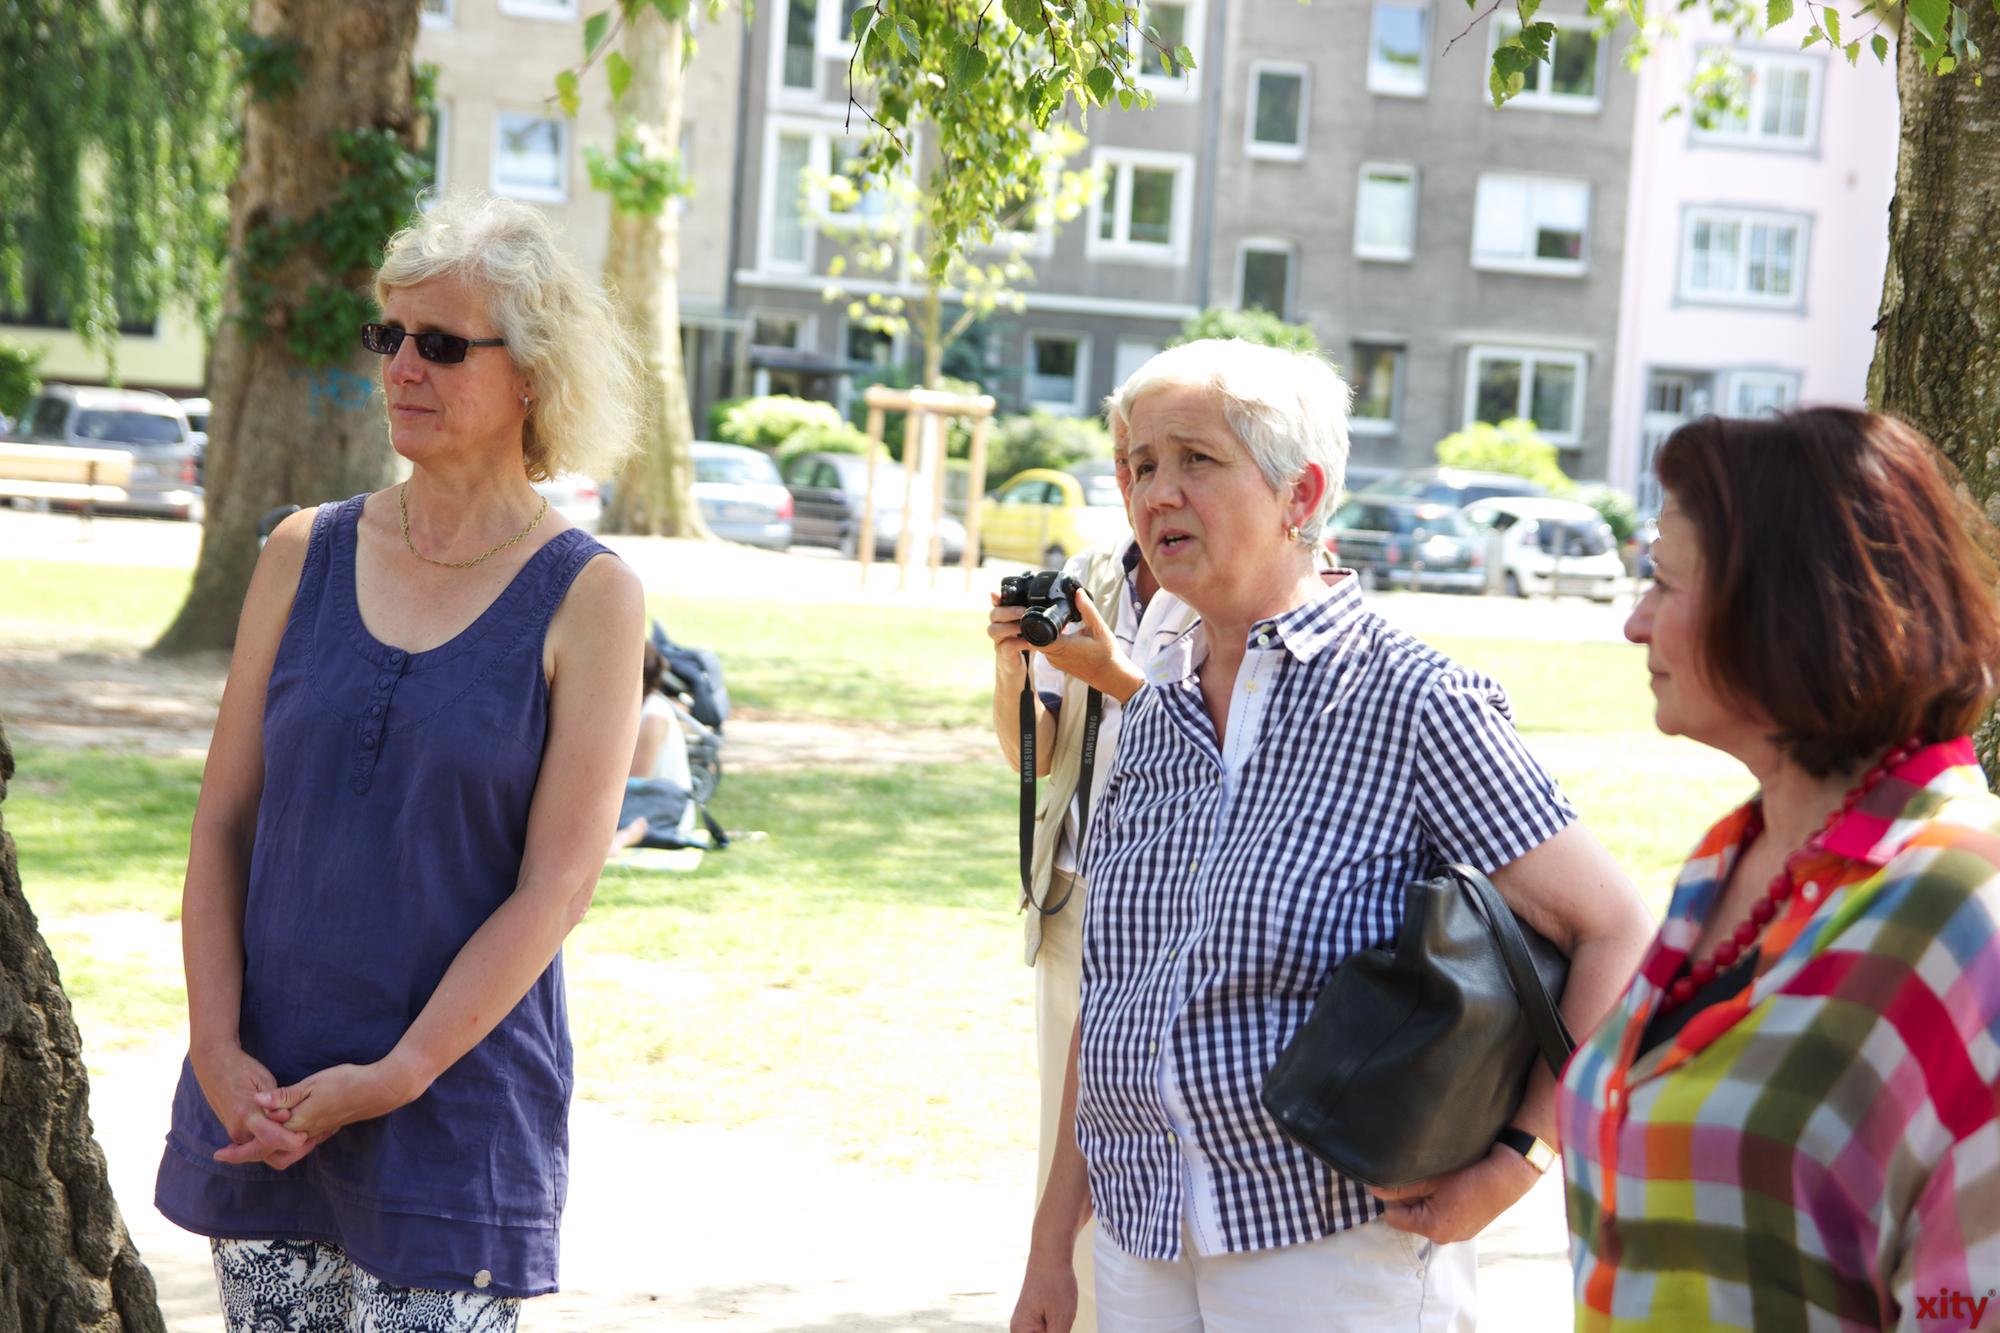 Doris Törkel nahm sich der Kritik an und hörte den Bürgern aufmerksam zu(Foto: xity)